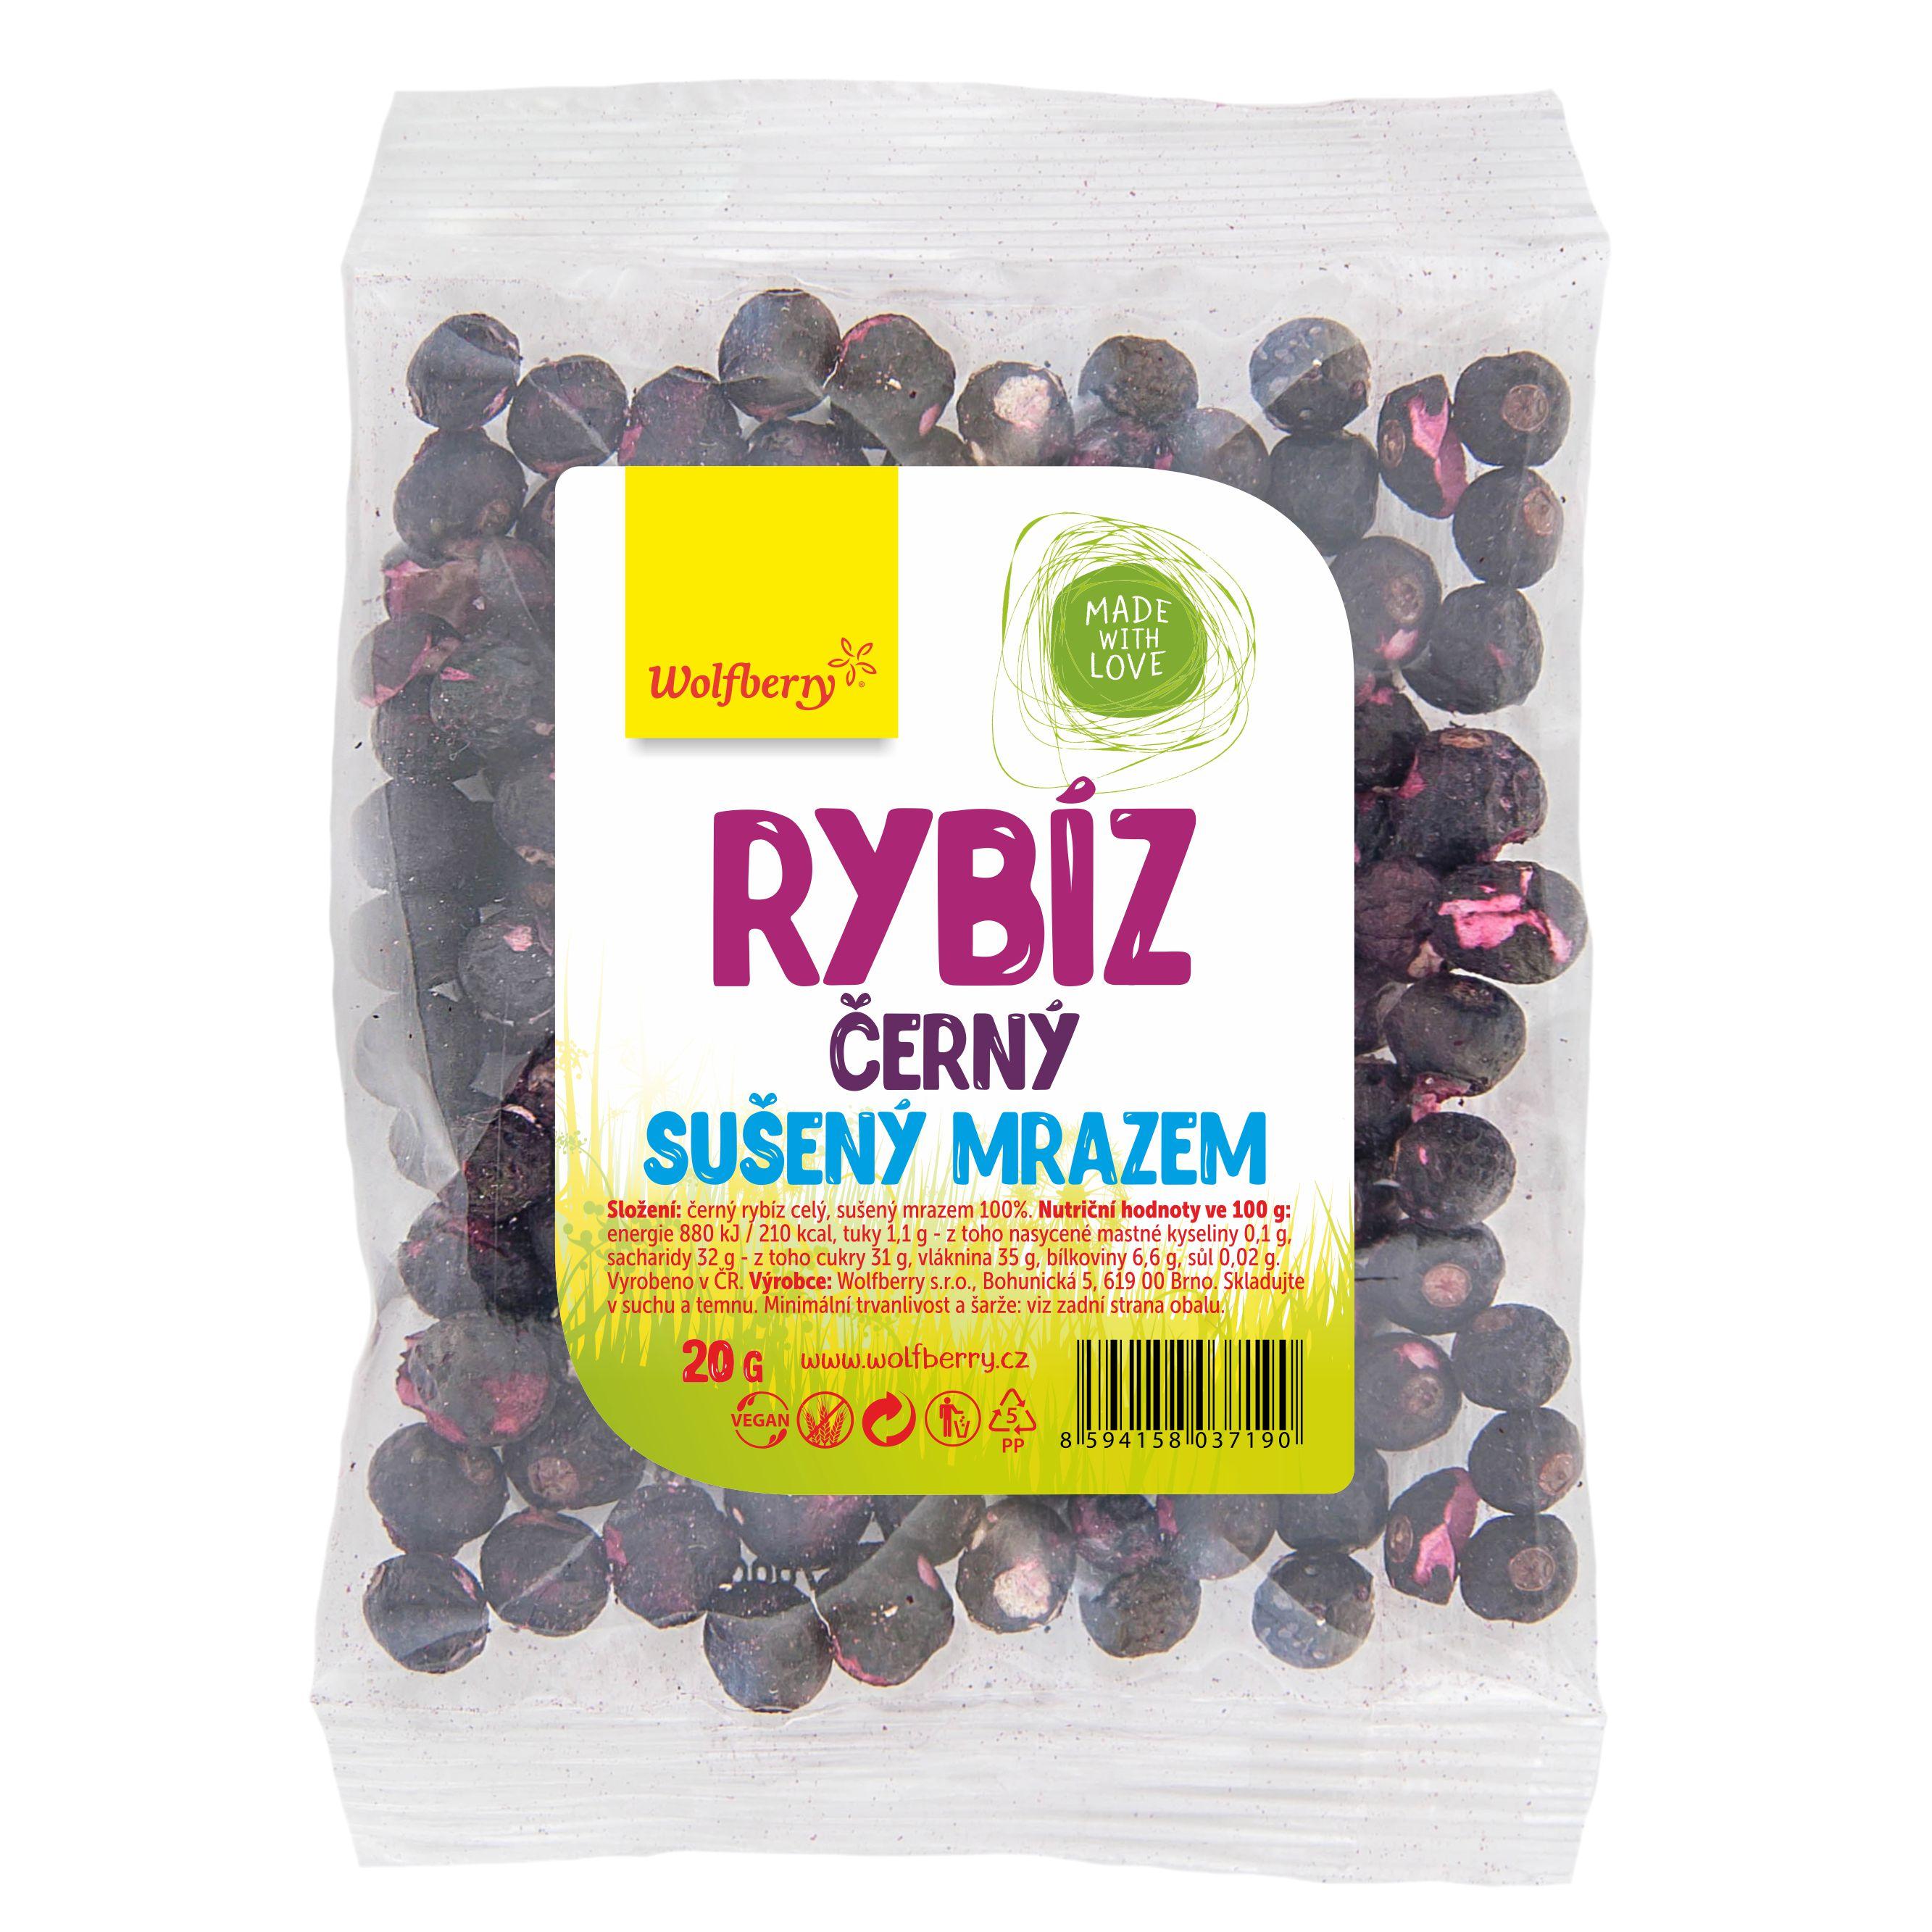 Fekete ribizli, liofilezett, 20 g, Wolfberry